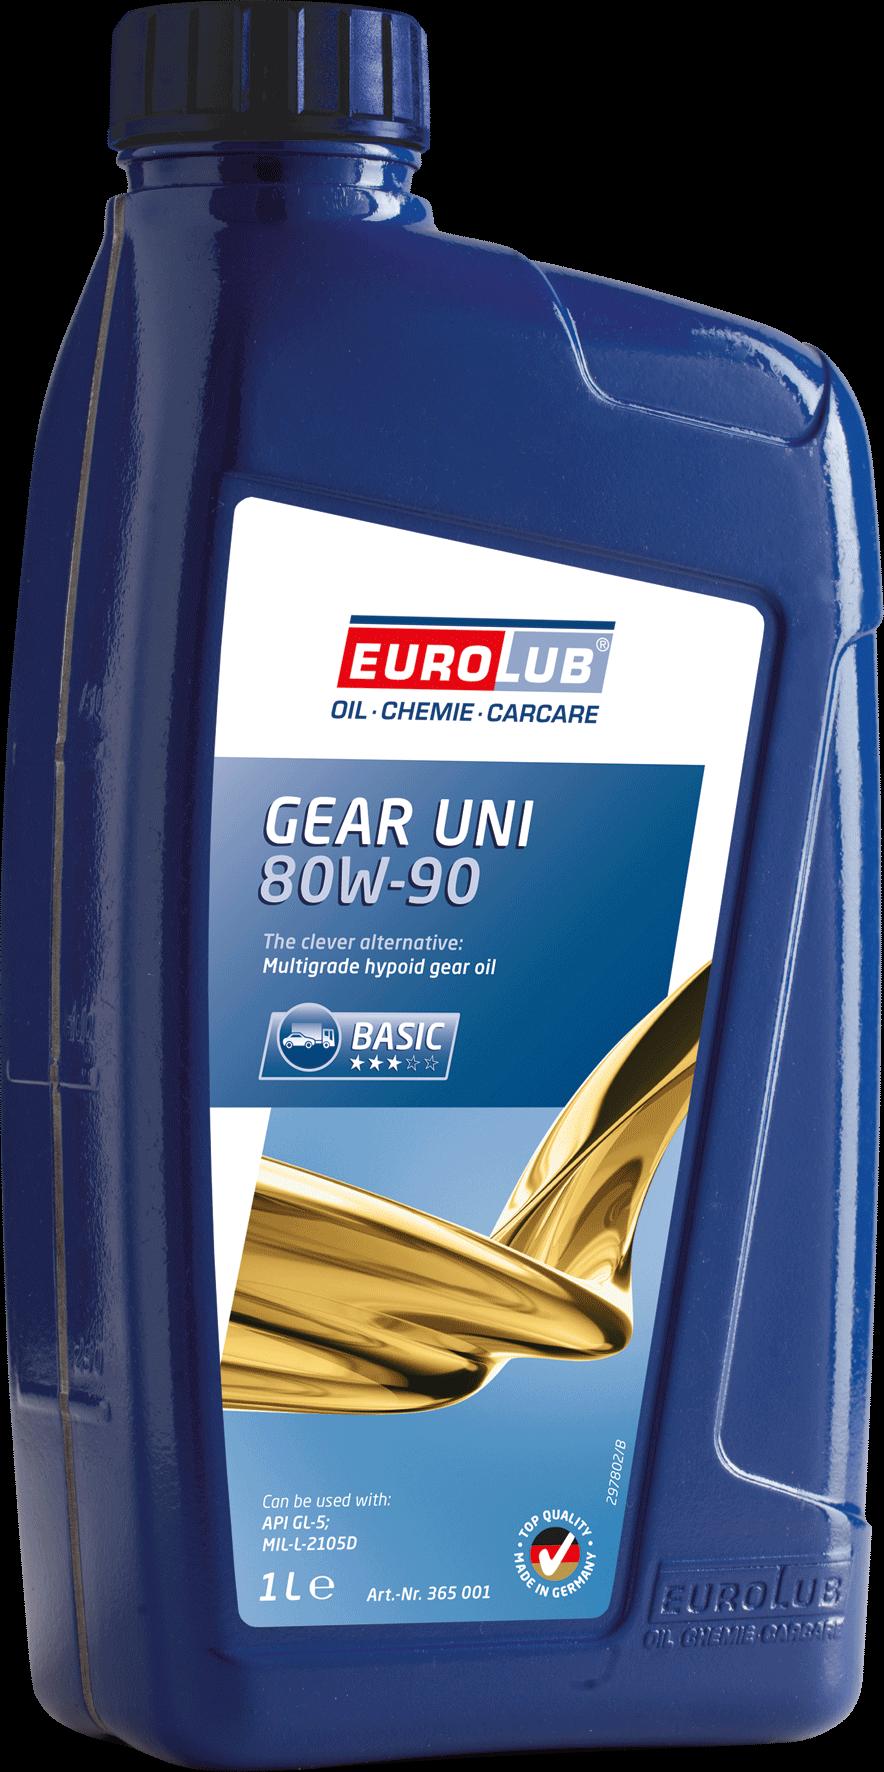 EUROLUB Gear Uni SAE 80W/90 (минеральное), 1л